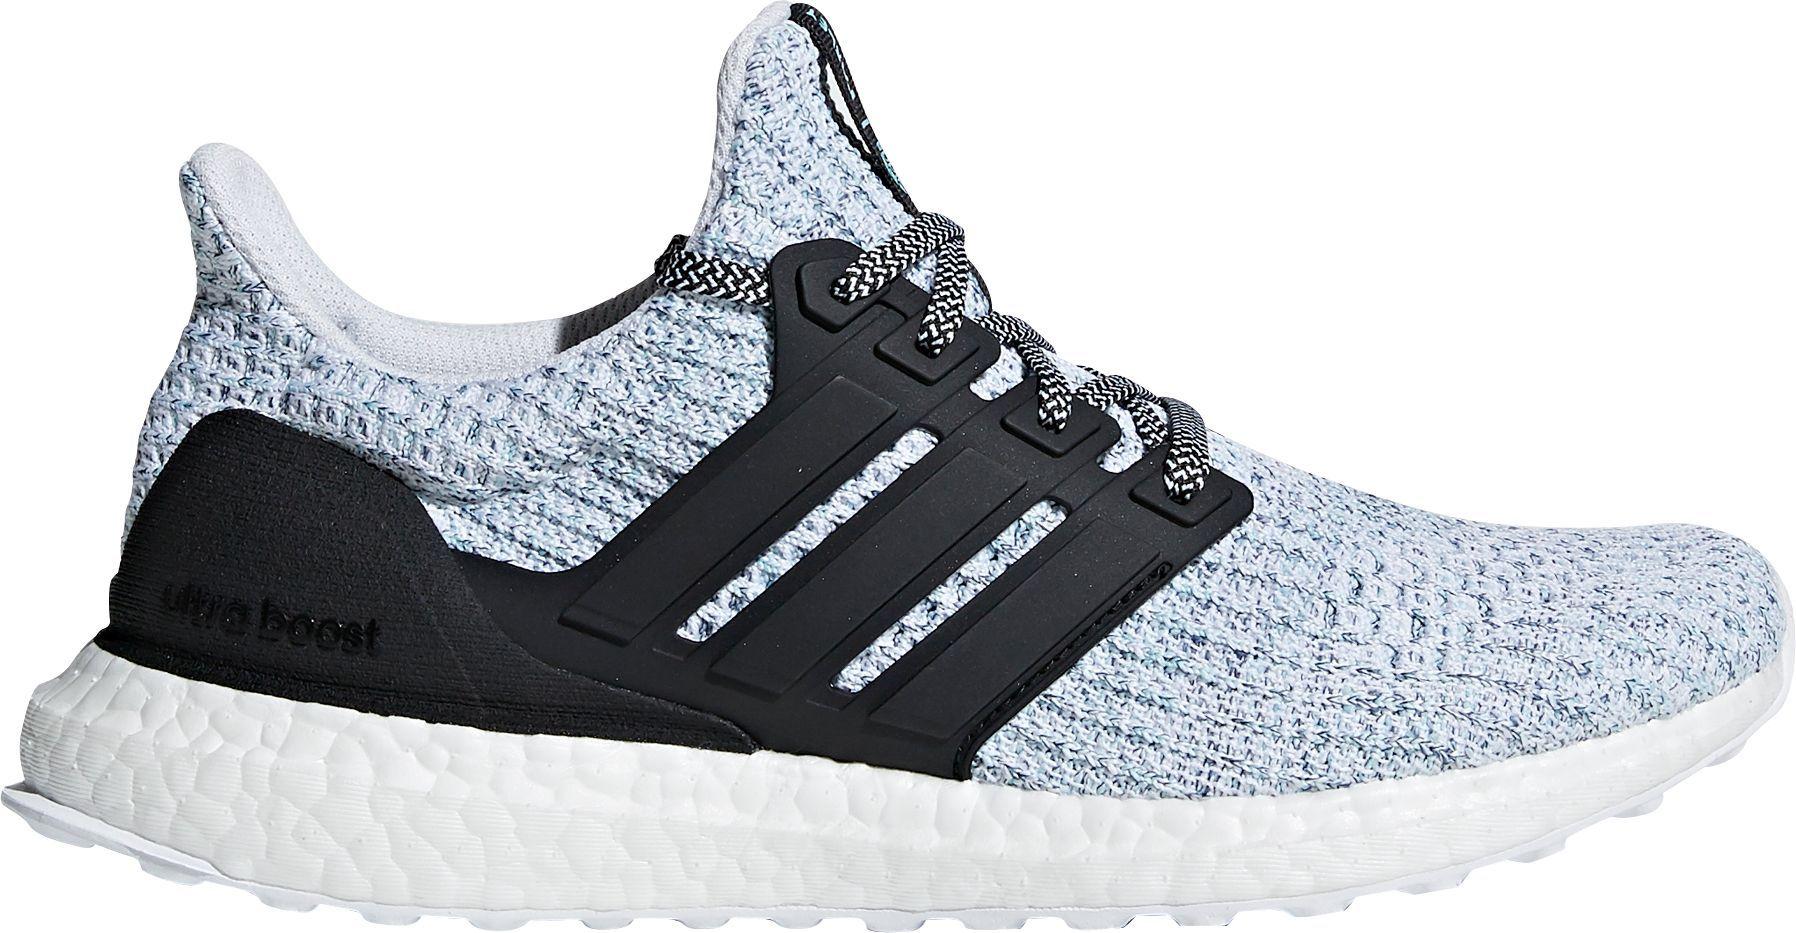 b4ac400e452e adidas Women s Ultra Boost Parley Running Shoes